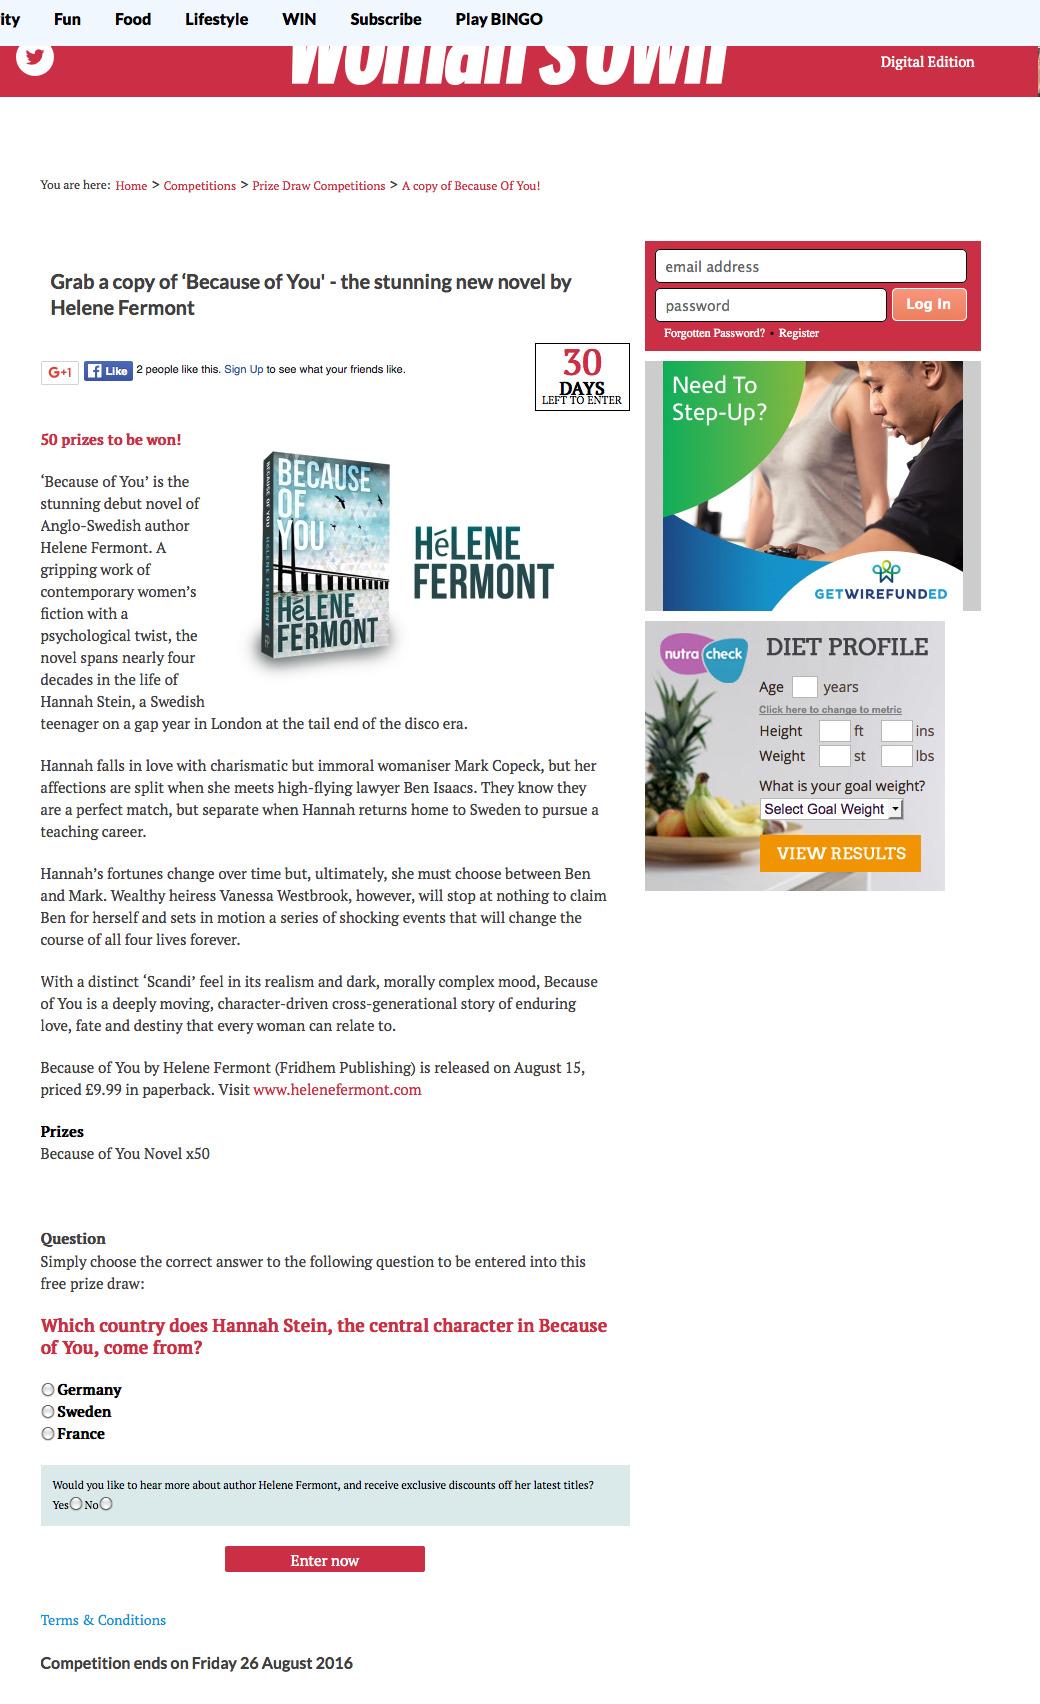 Palamedes PR, the book PR agency